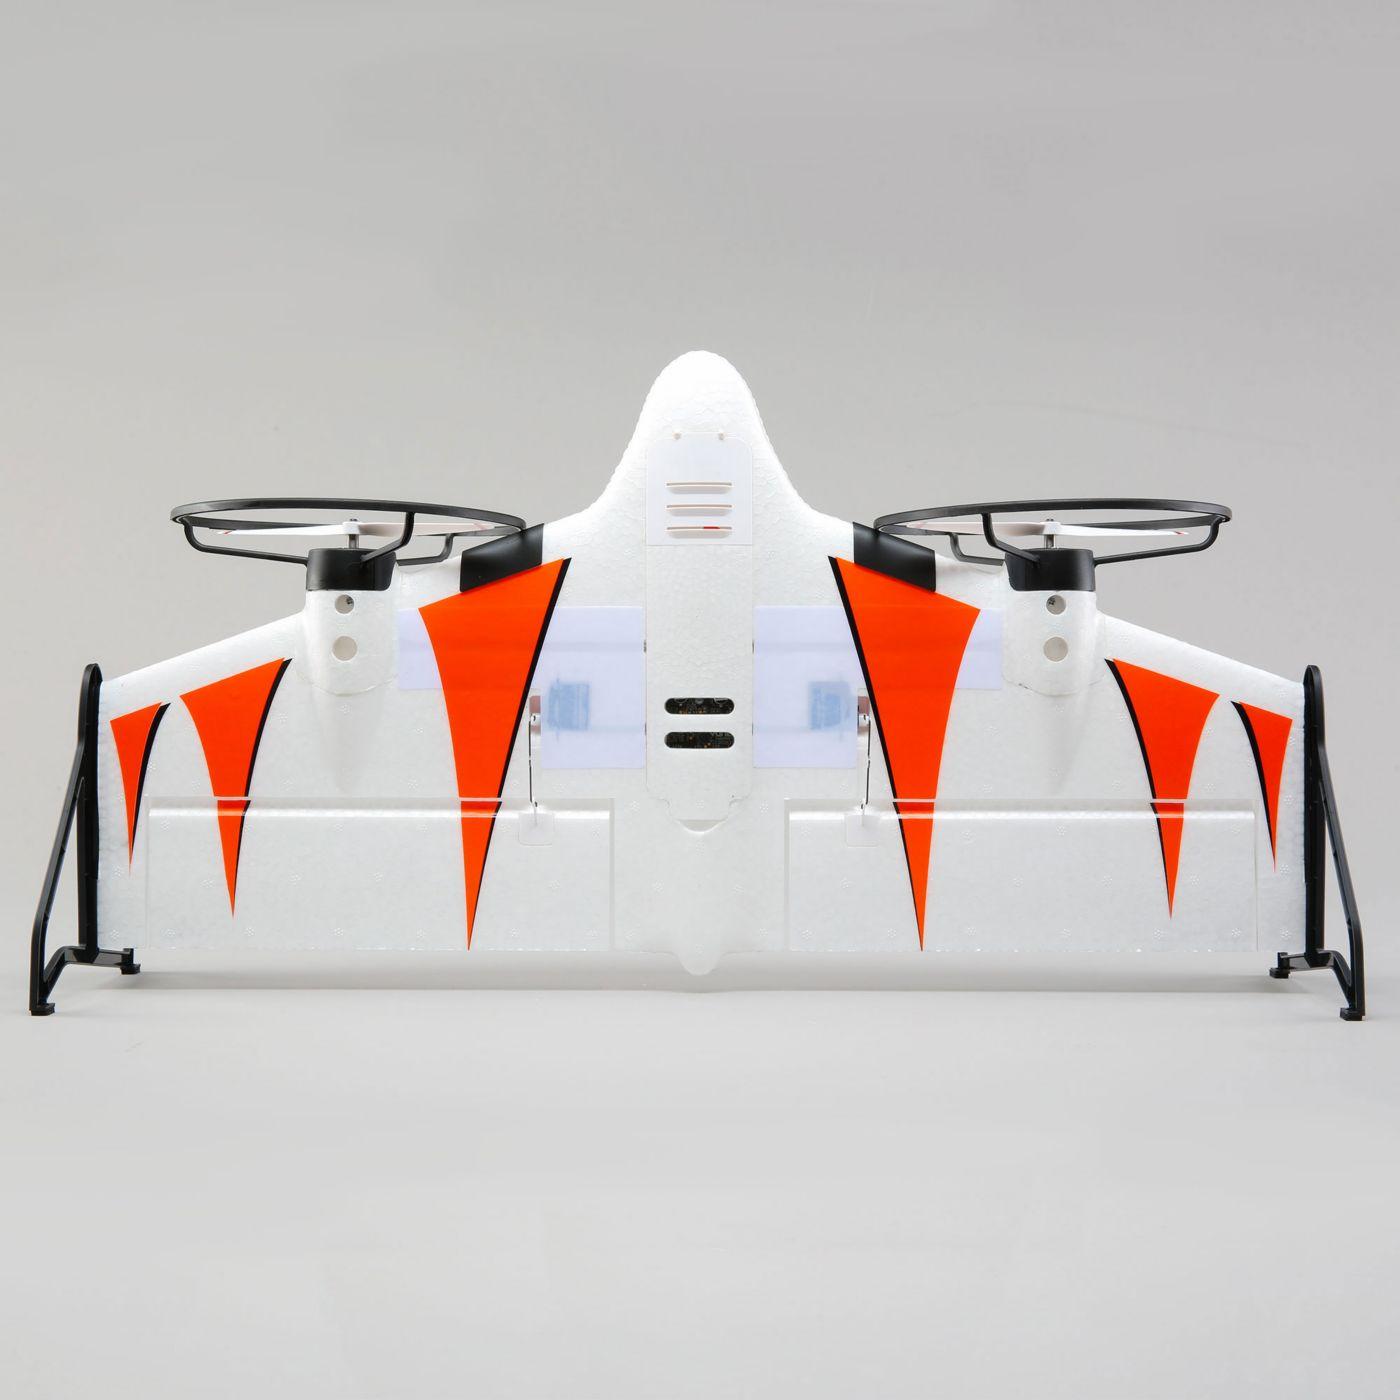 EFL1807 E-flite Decal Trim Sheet Set X-VERT VTOL